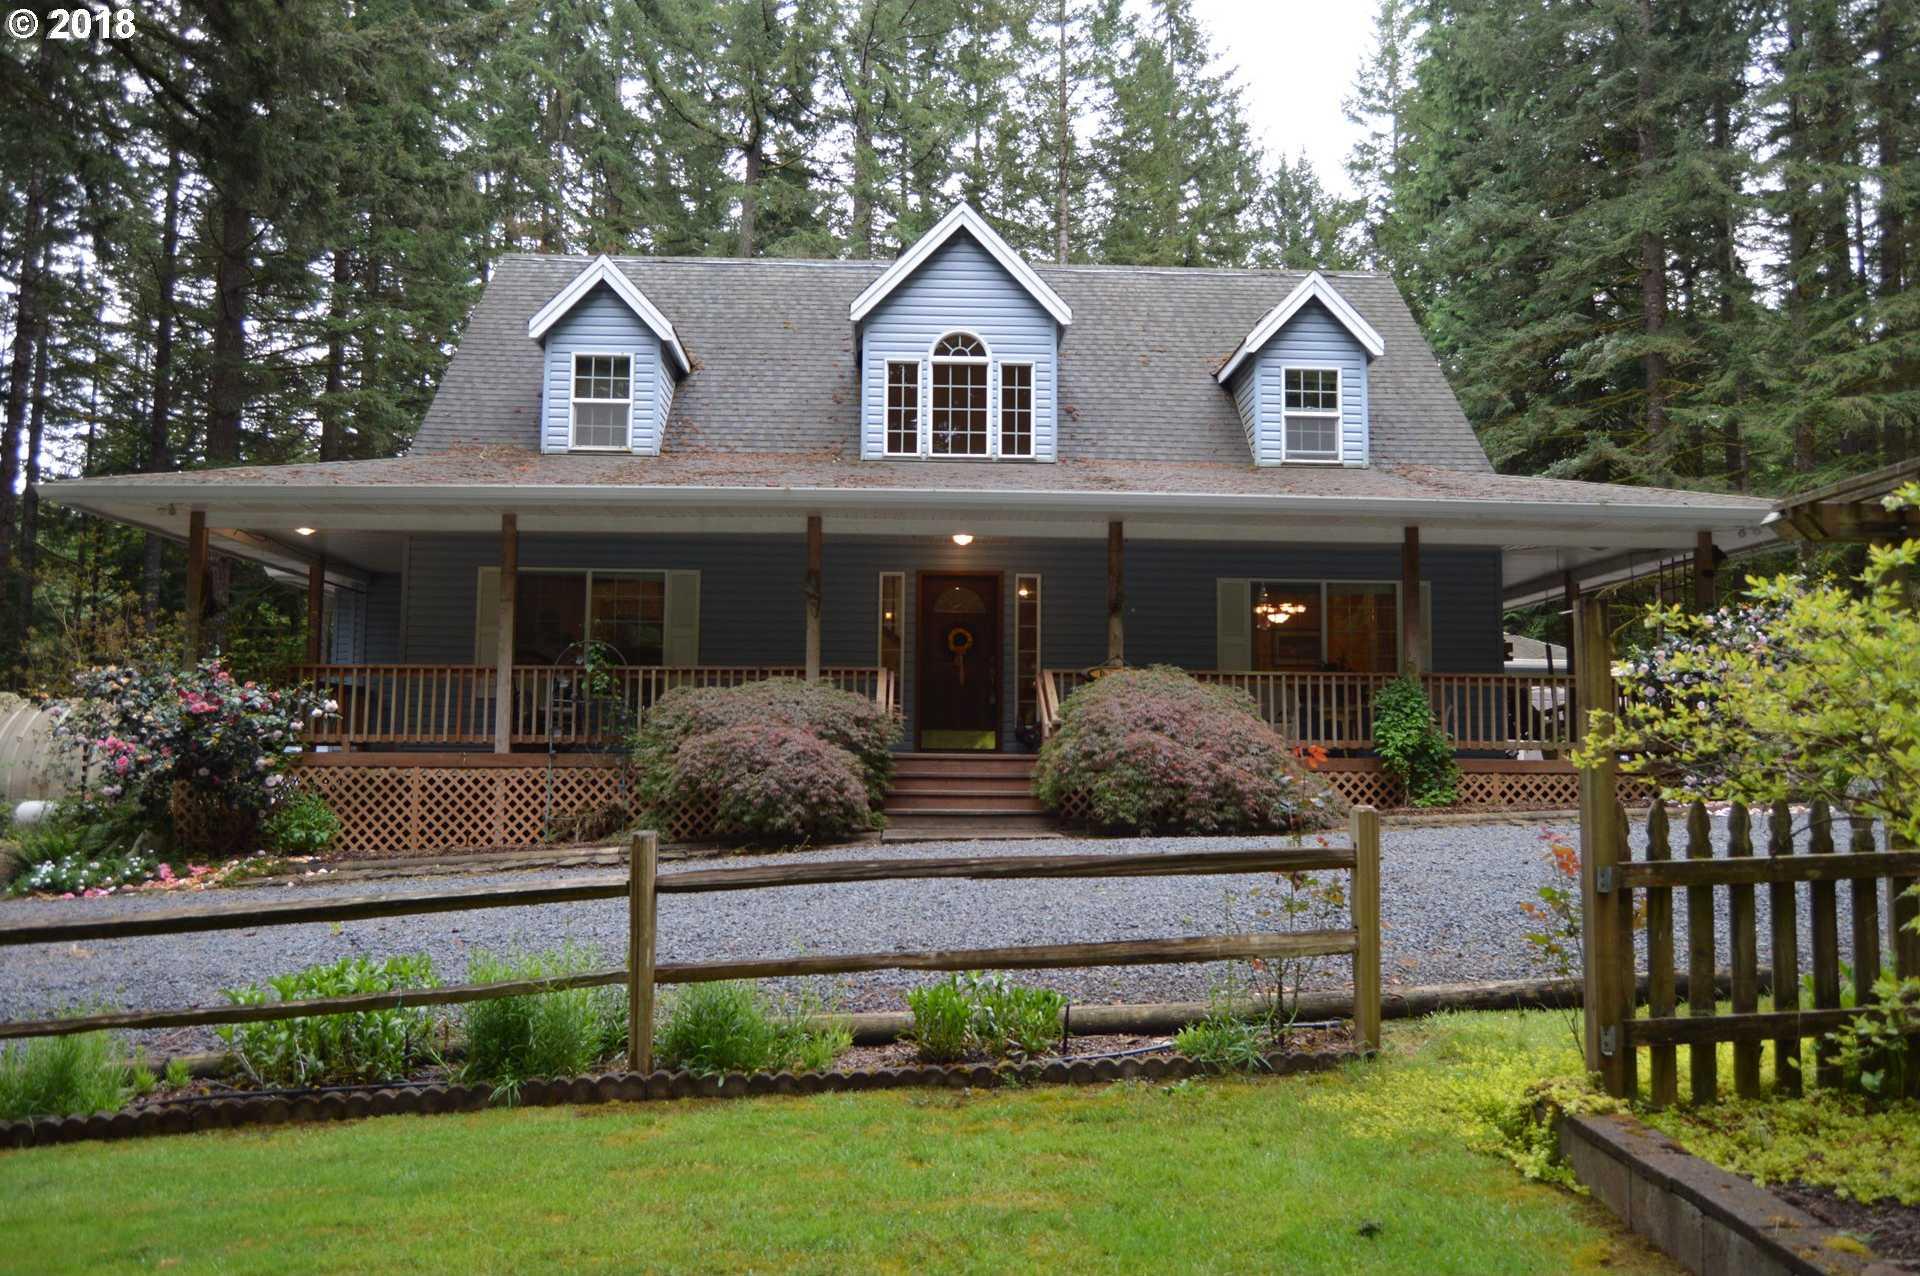 $579,000 - 4Br/3Ba -  for Sale in Leisure Woods, Beavercreek